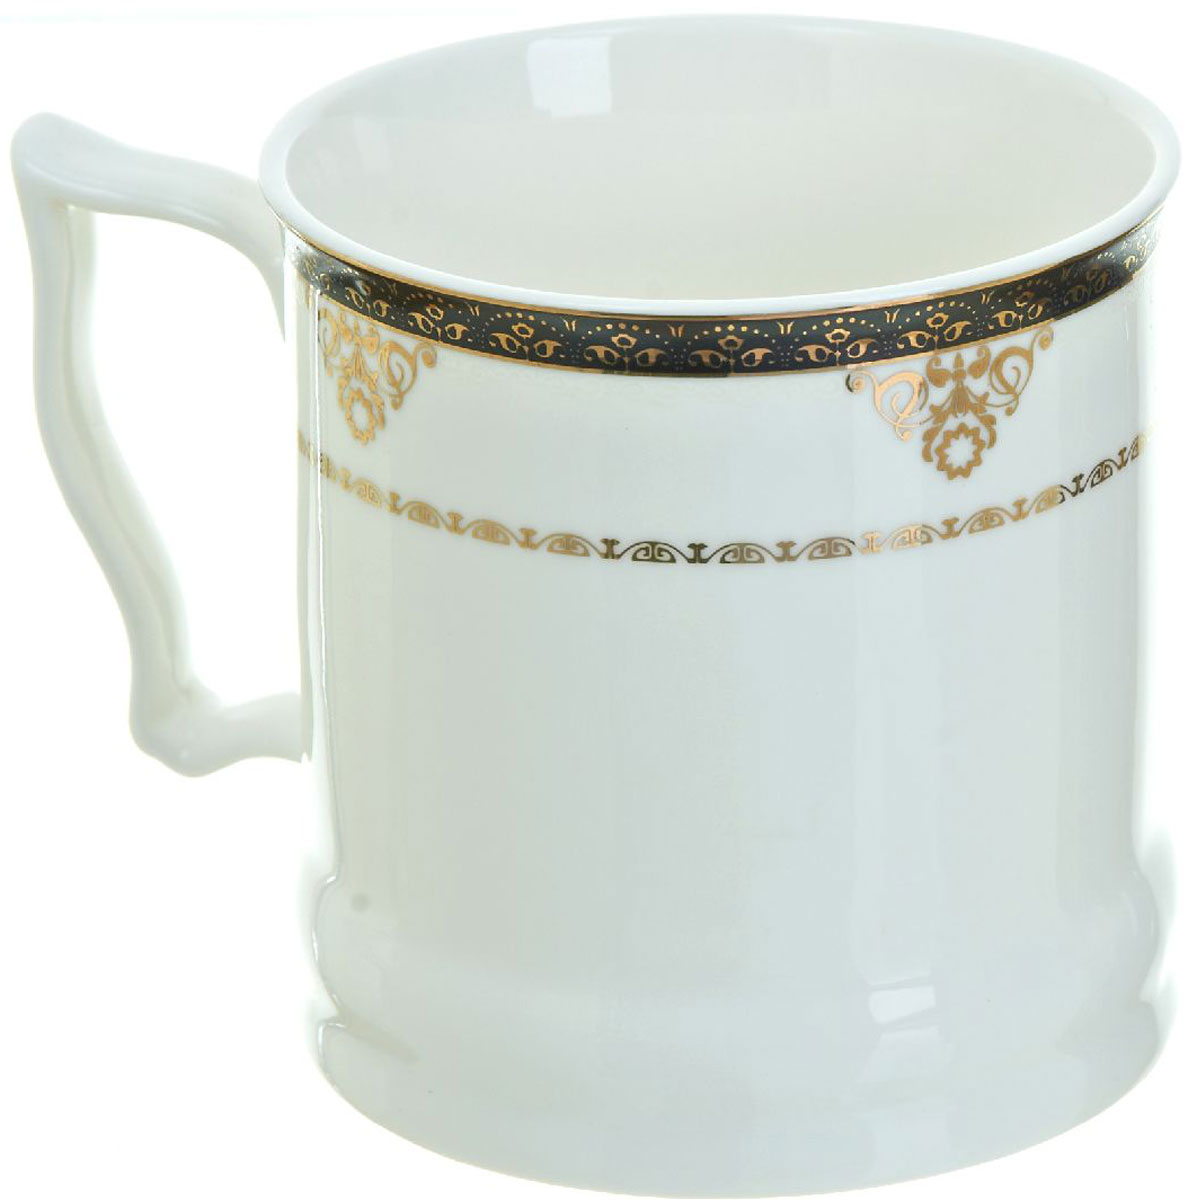 Кружка BHP Королевская кружка, 500 мл. 1870007 кружка amber porcelain сердечки 220 мл